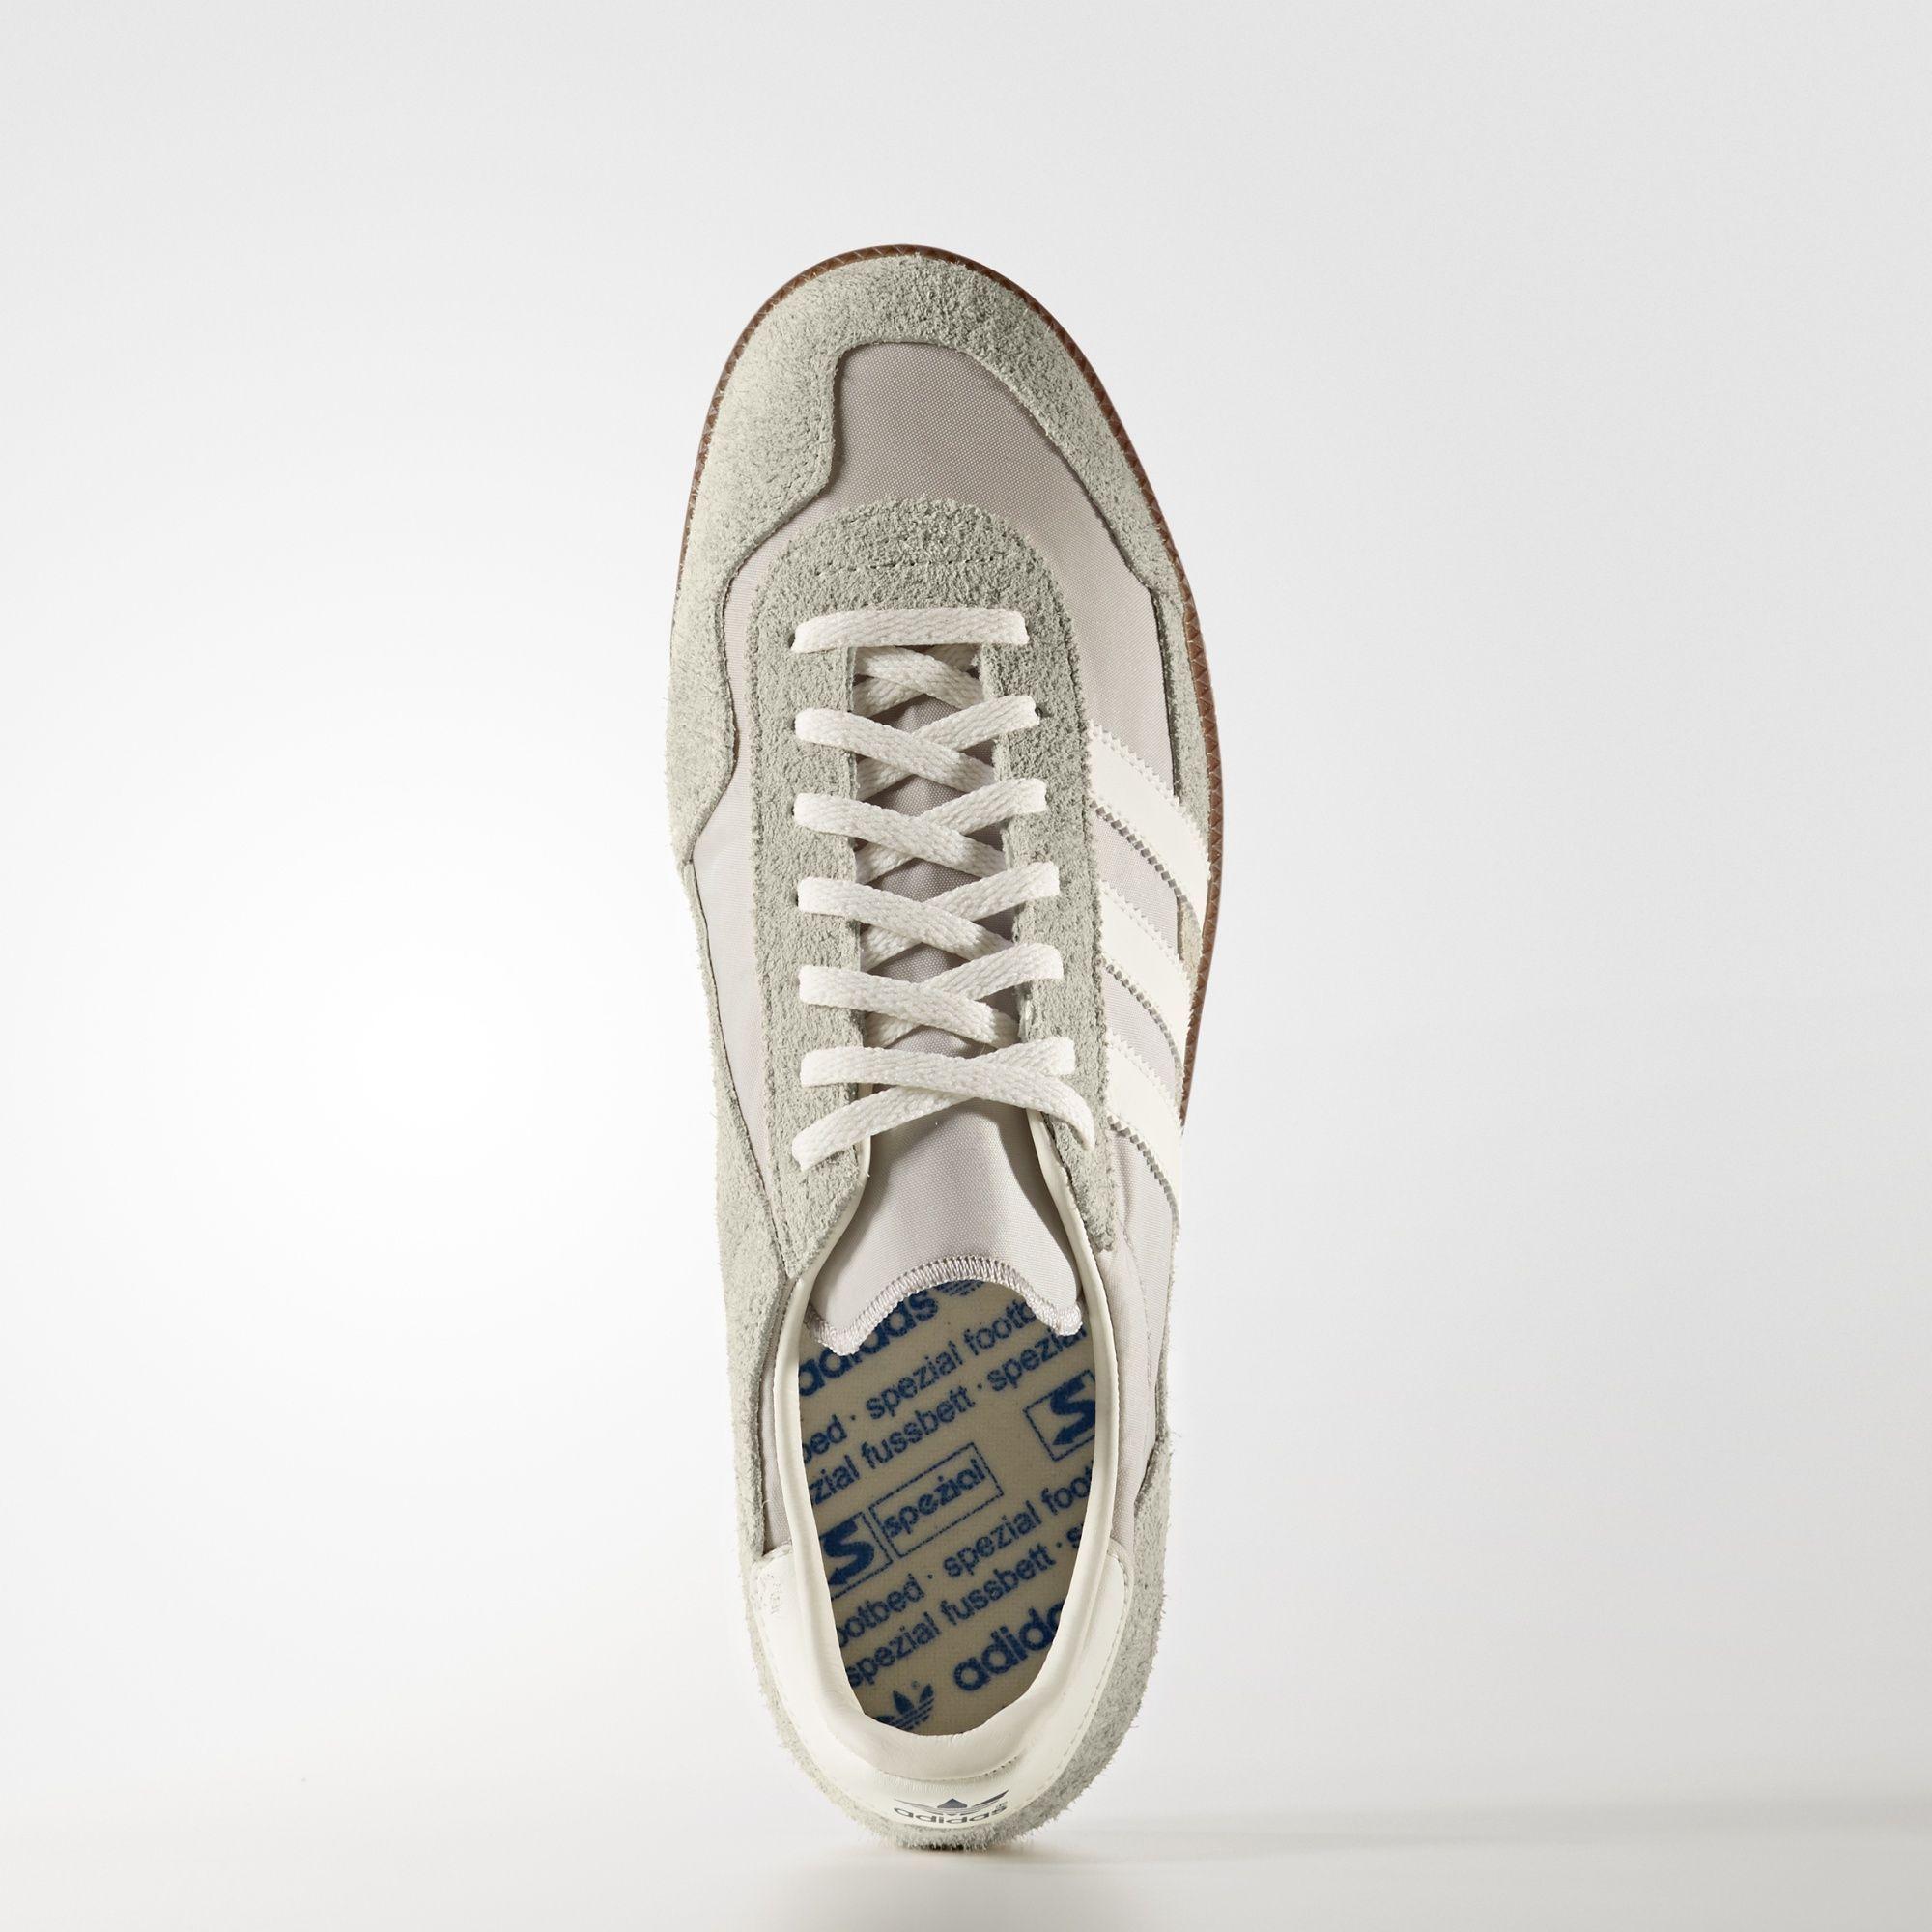 Adidas wensley pinterest spzl le scarpe adidas, calzature